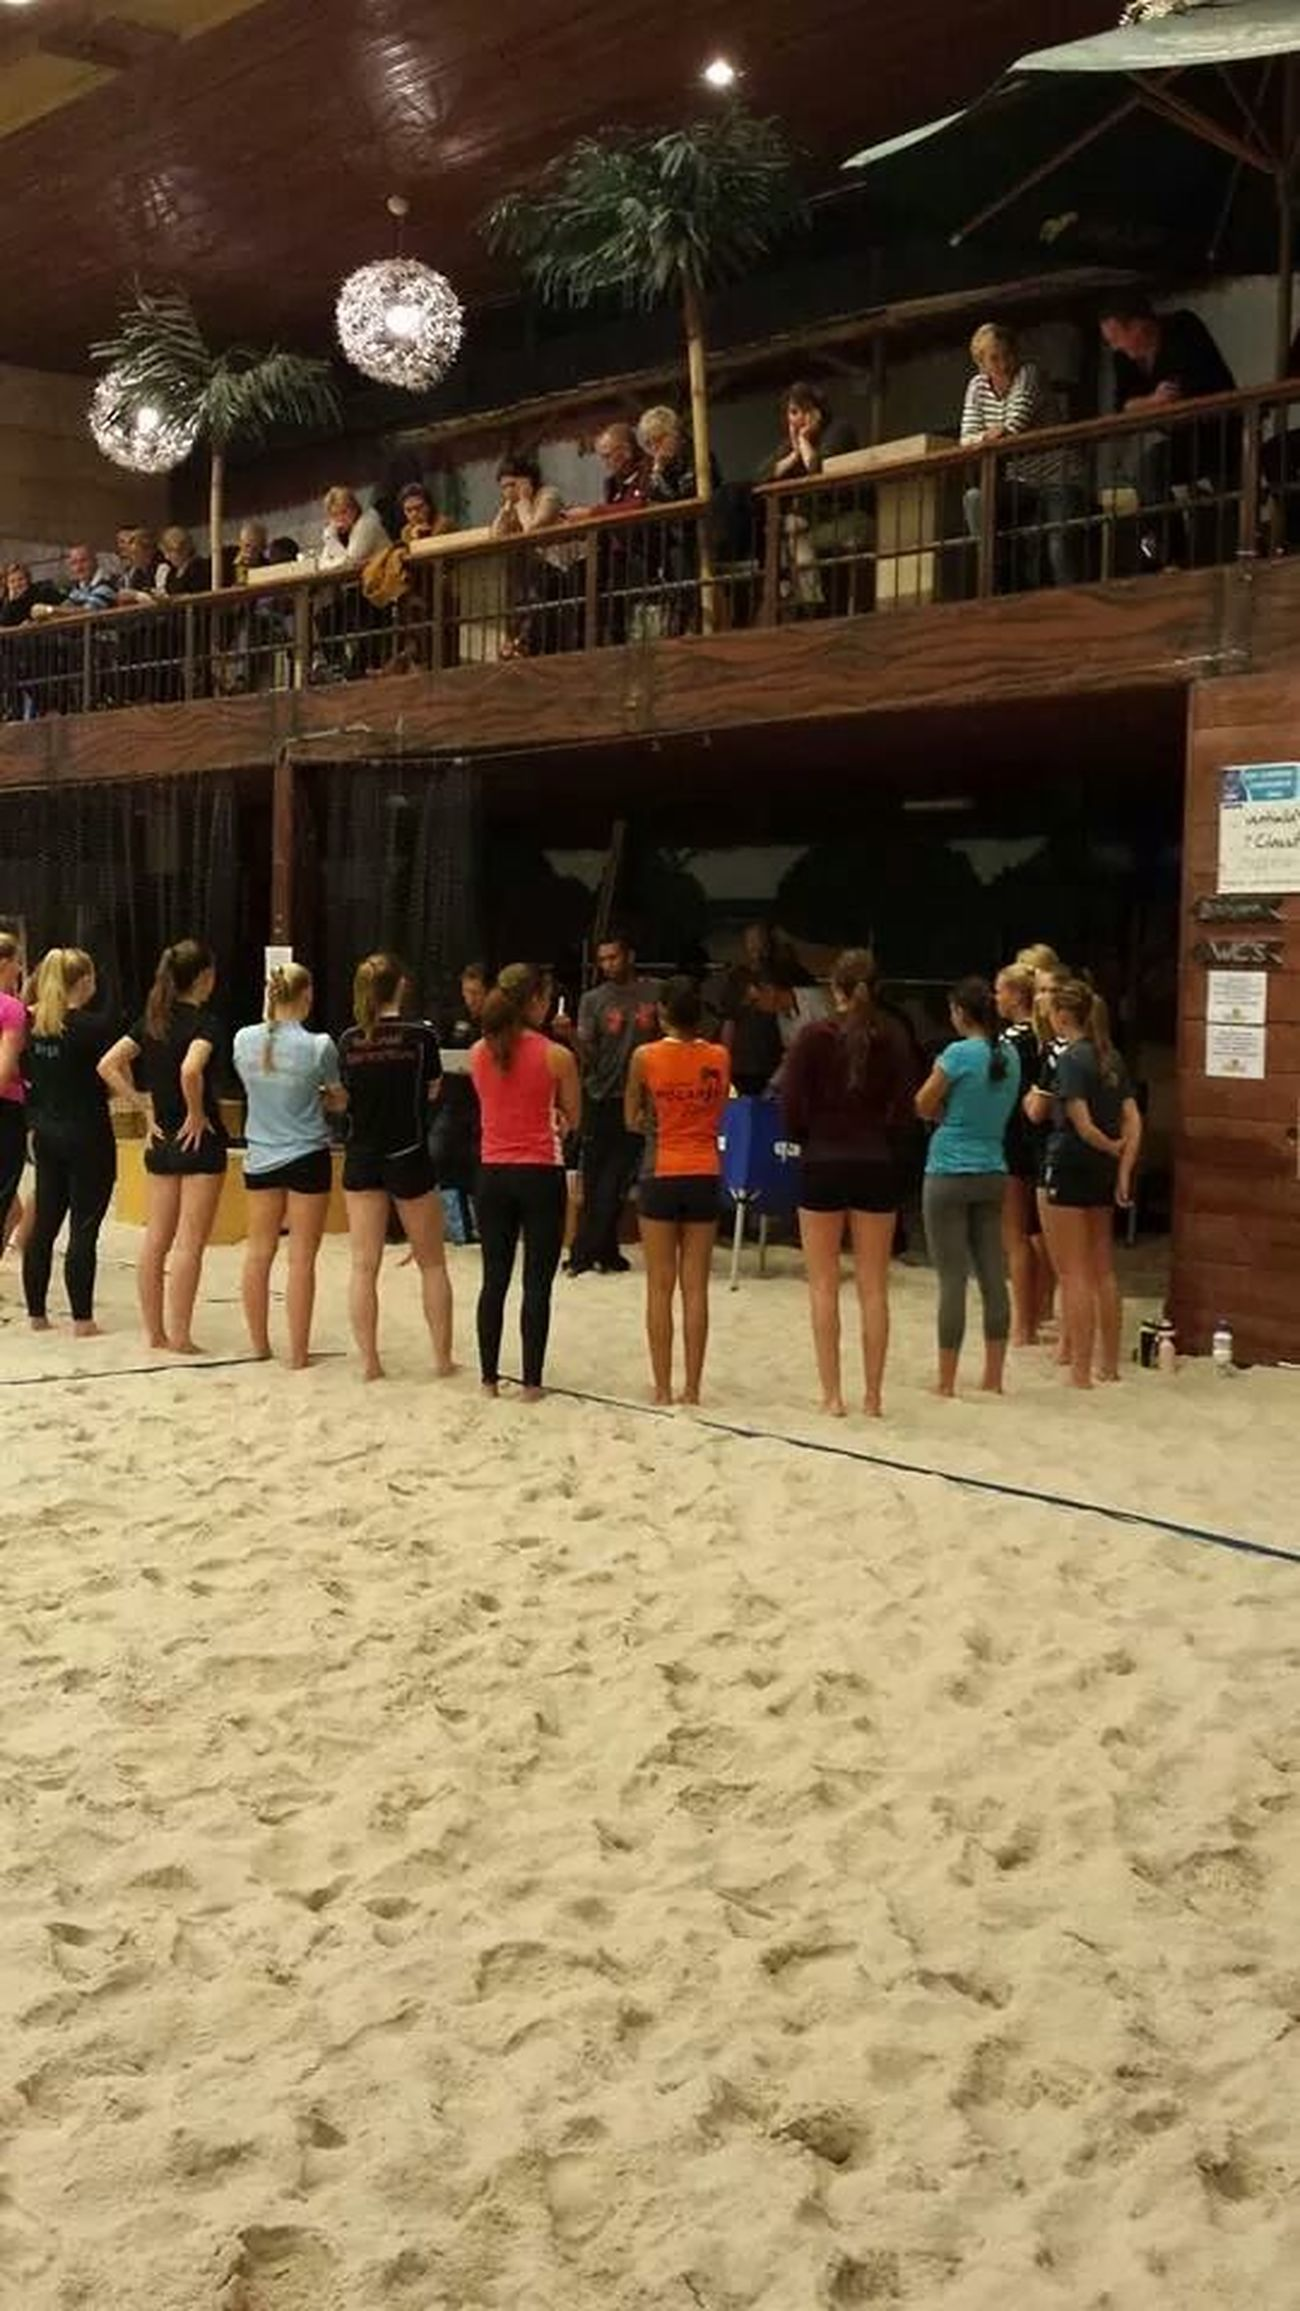 Selectie Jeugd Oranje beachvolleybal Jeugd Oranje Beachvolleyball Netherlands Btn